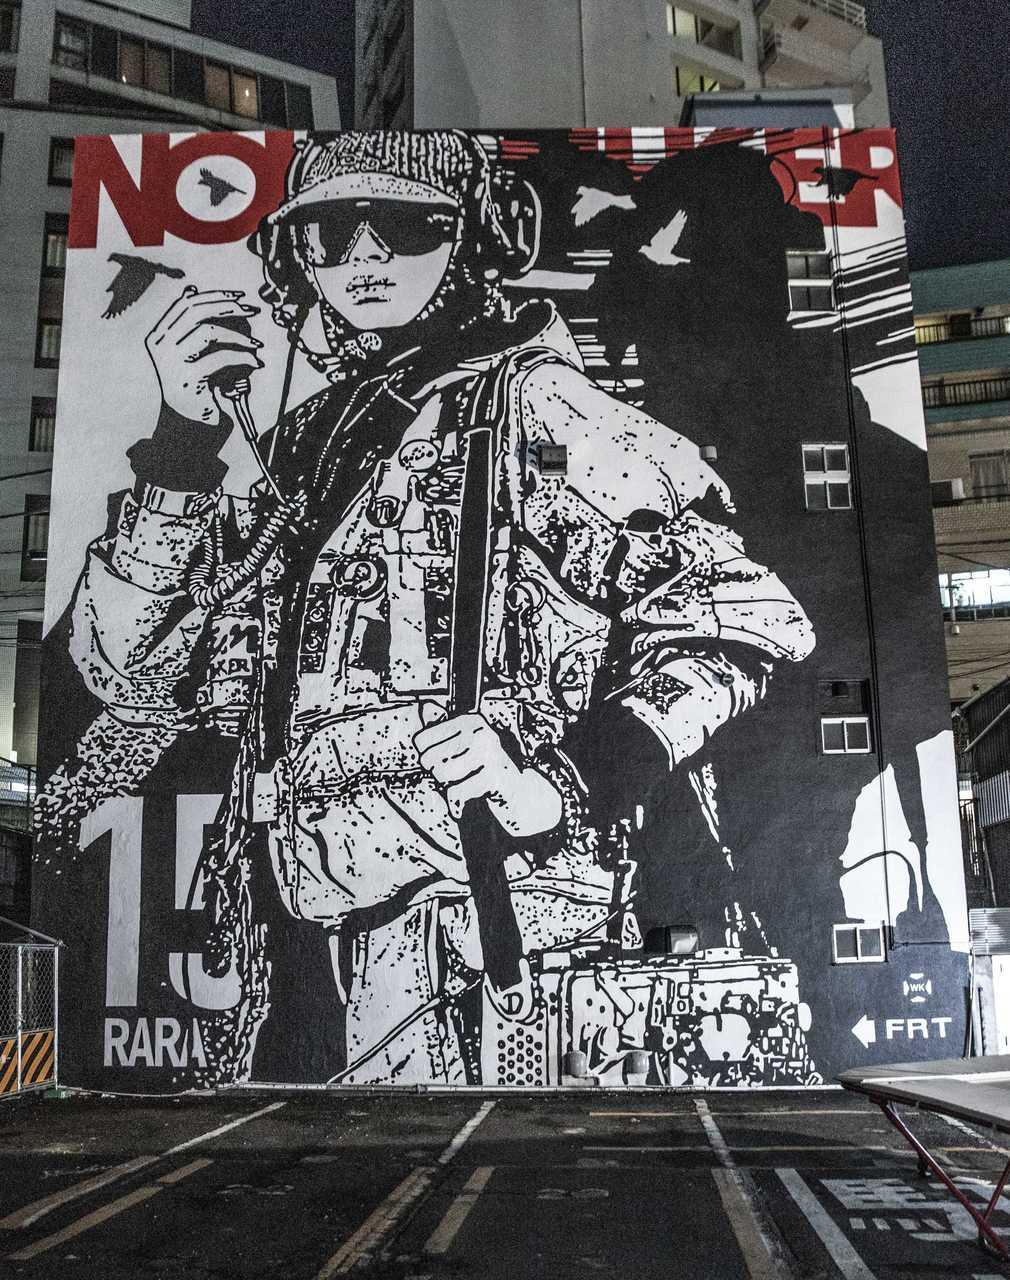 NOISEMAKER×WK Interact、ミニアルバム『RARA』渋谷巨壁ジャケット